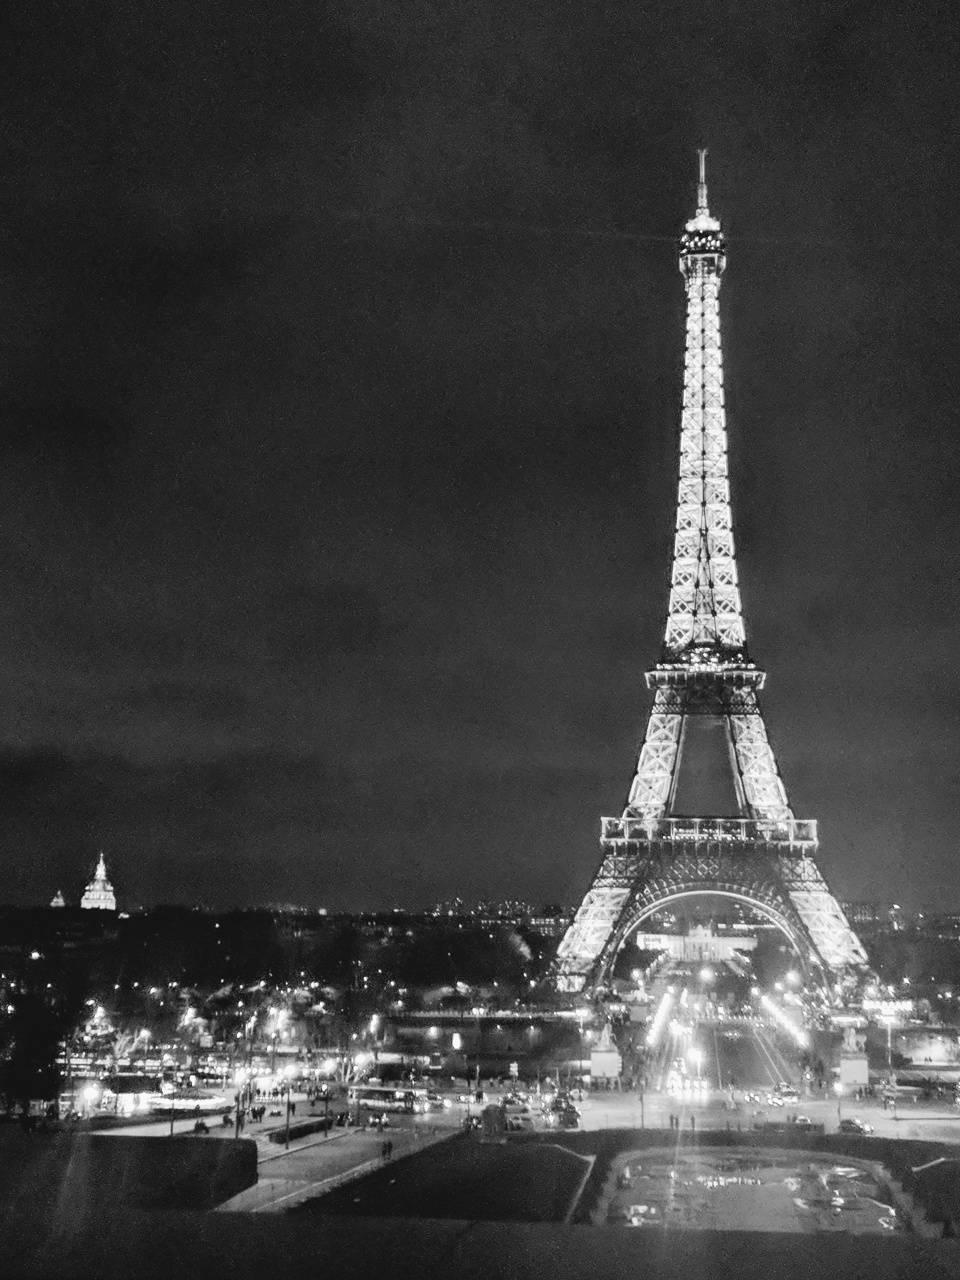 Paris At Night Wallpaper By Bojangler 89 Free On Zedge